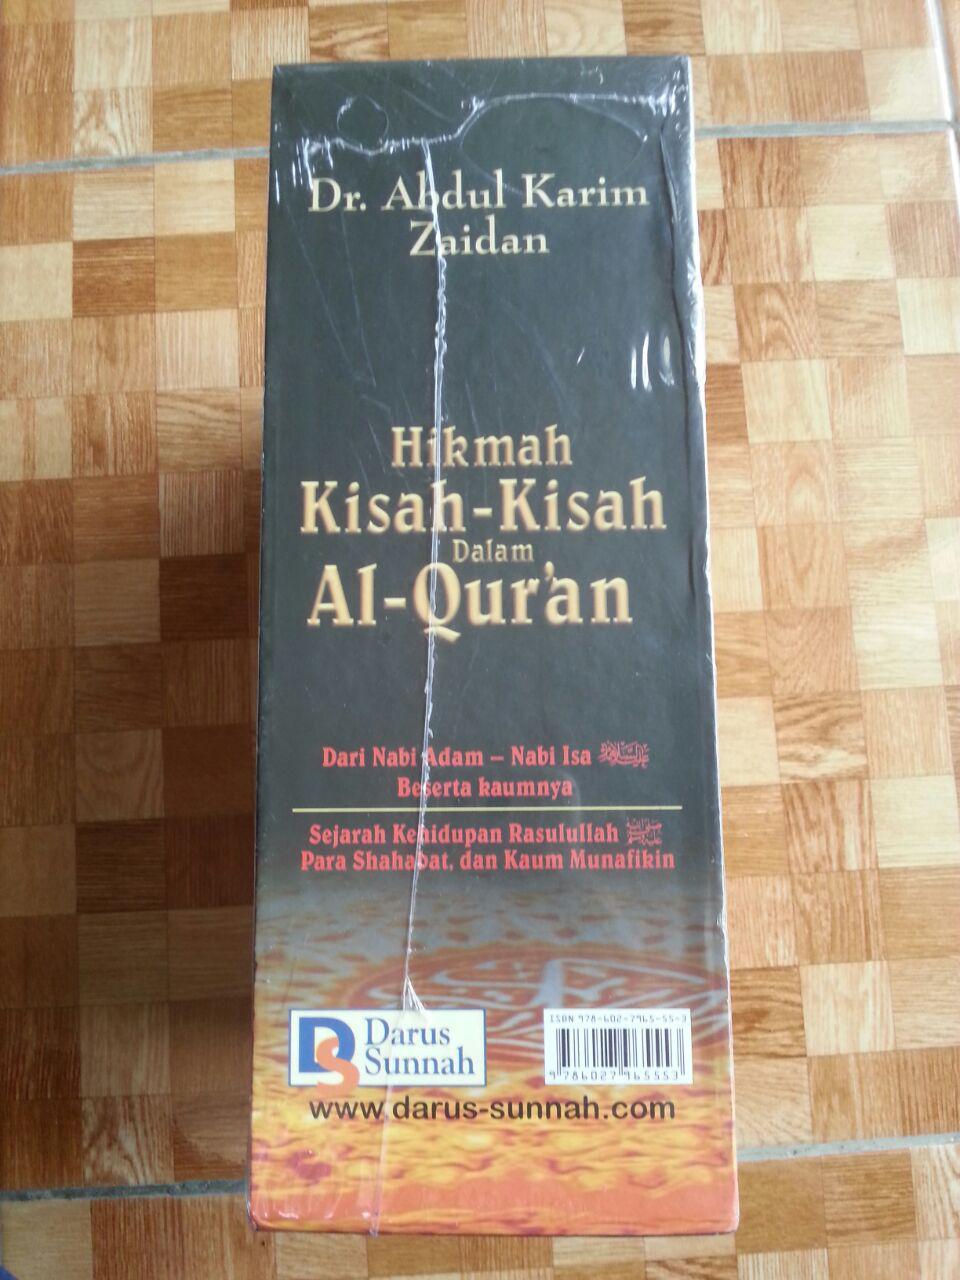 Buku Hikmah Kisah-Kisah Dalam Al-Qur'an cover